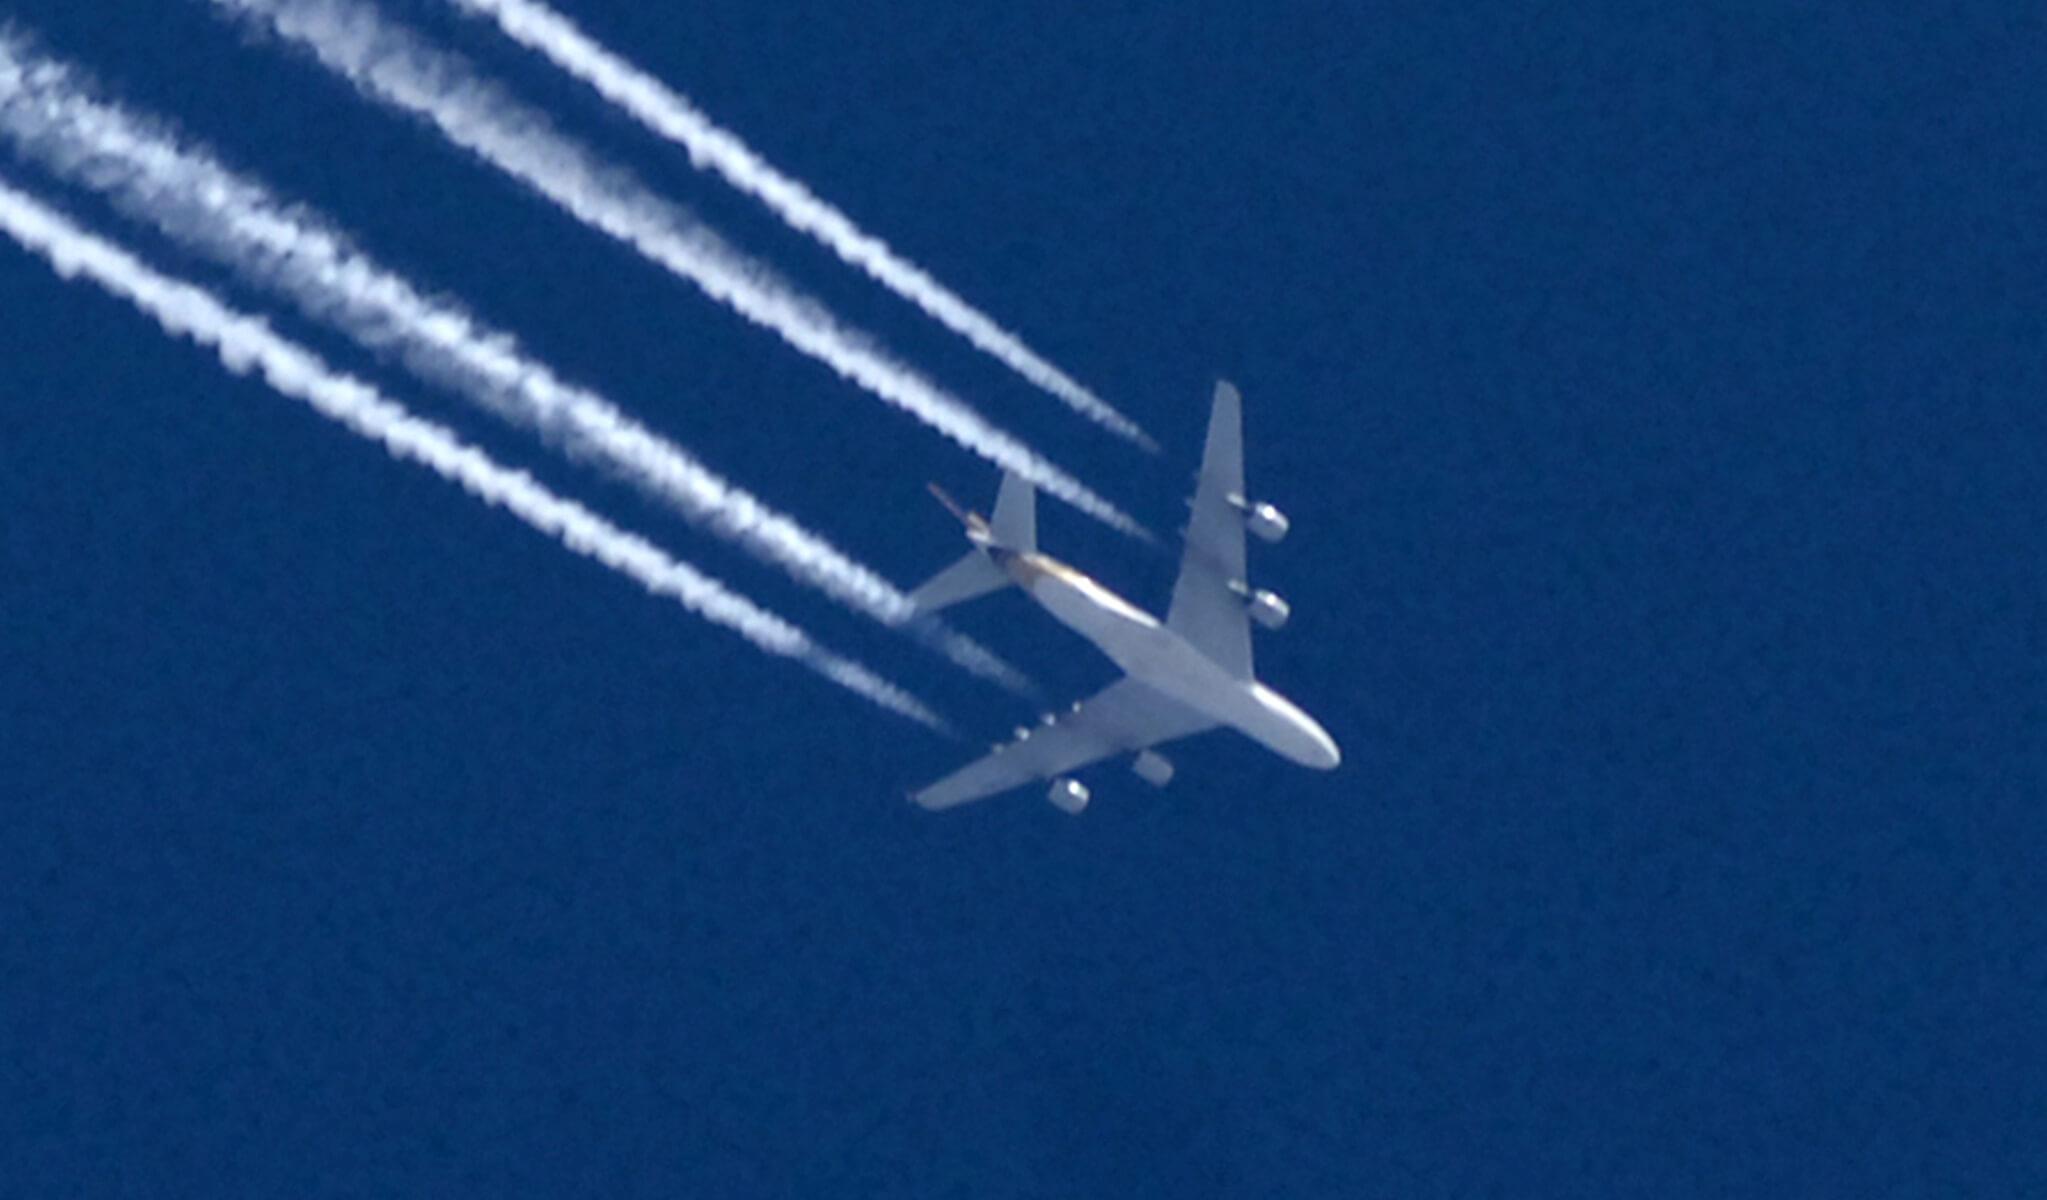 "Sky Express: Η προσγείωση θρίλερ, το ""κόψιμο"" επιβατών από πτήση, οι βαλίτσες που βρέθηκαν αλλού και άλλες ιστορίες…"